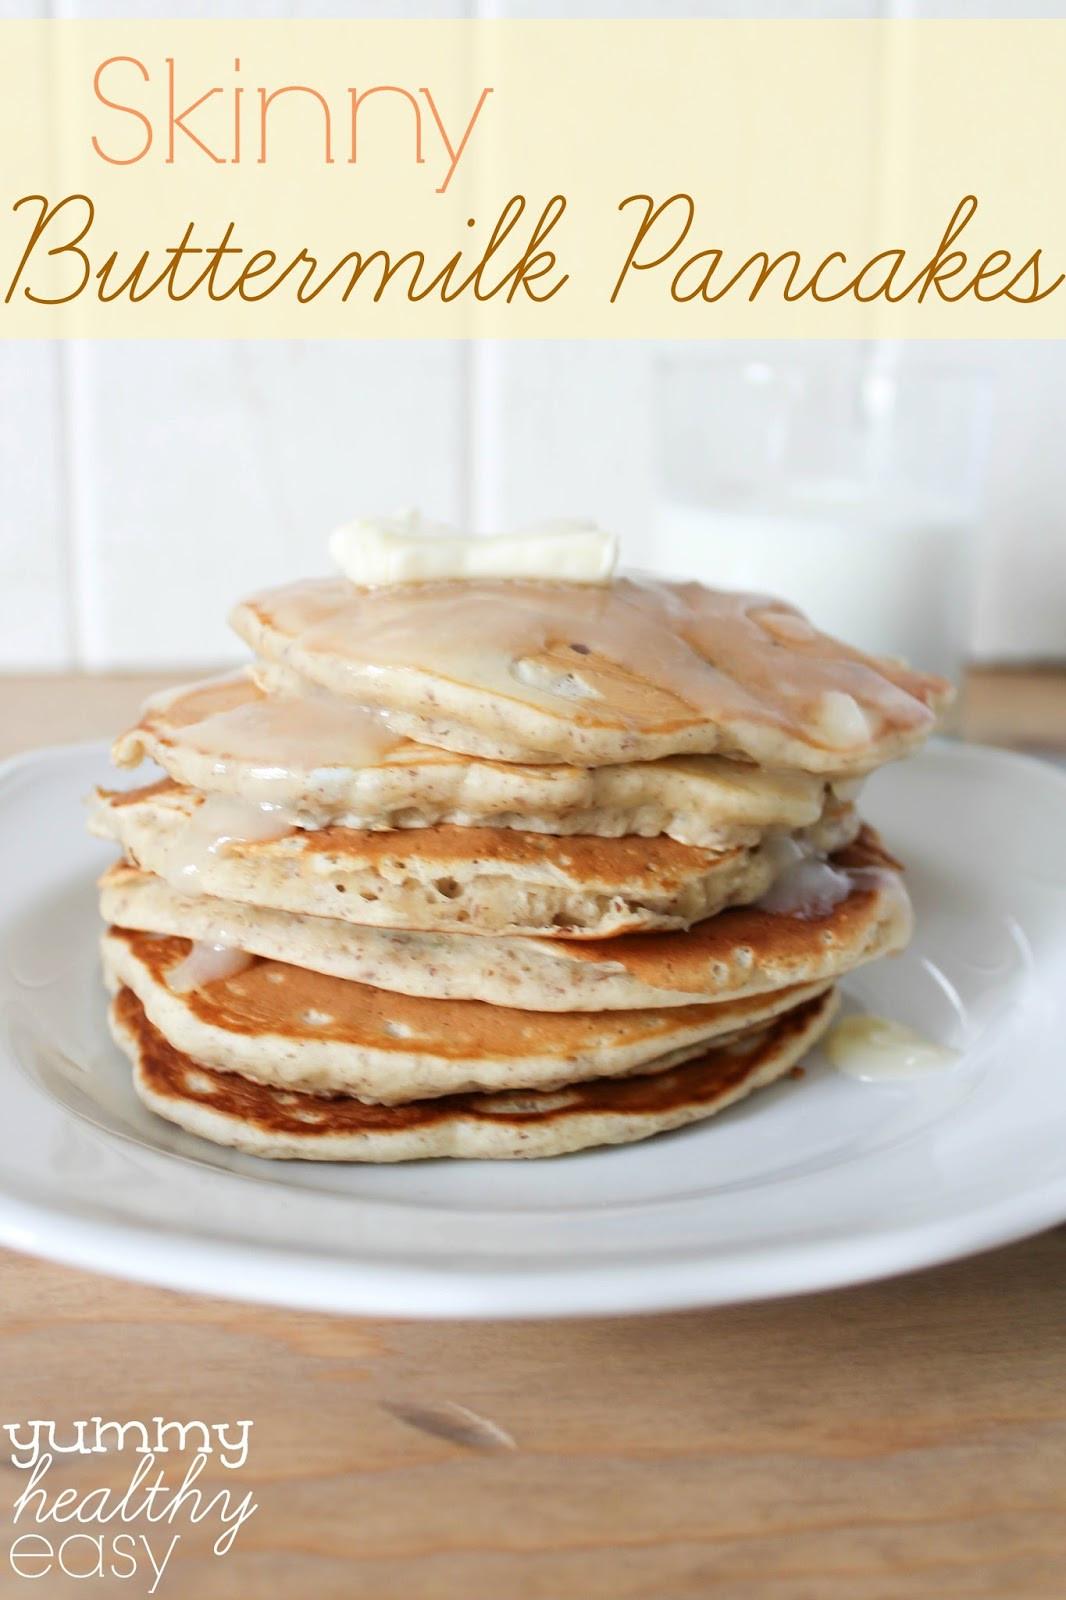 Healthy Buttermilk Pancakes  Skinny Buttermilk Pancakes Yummy Healthy Easy